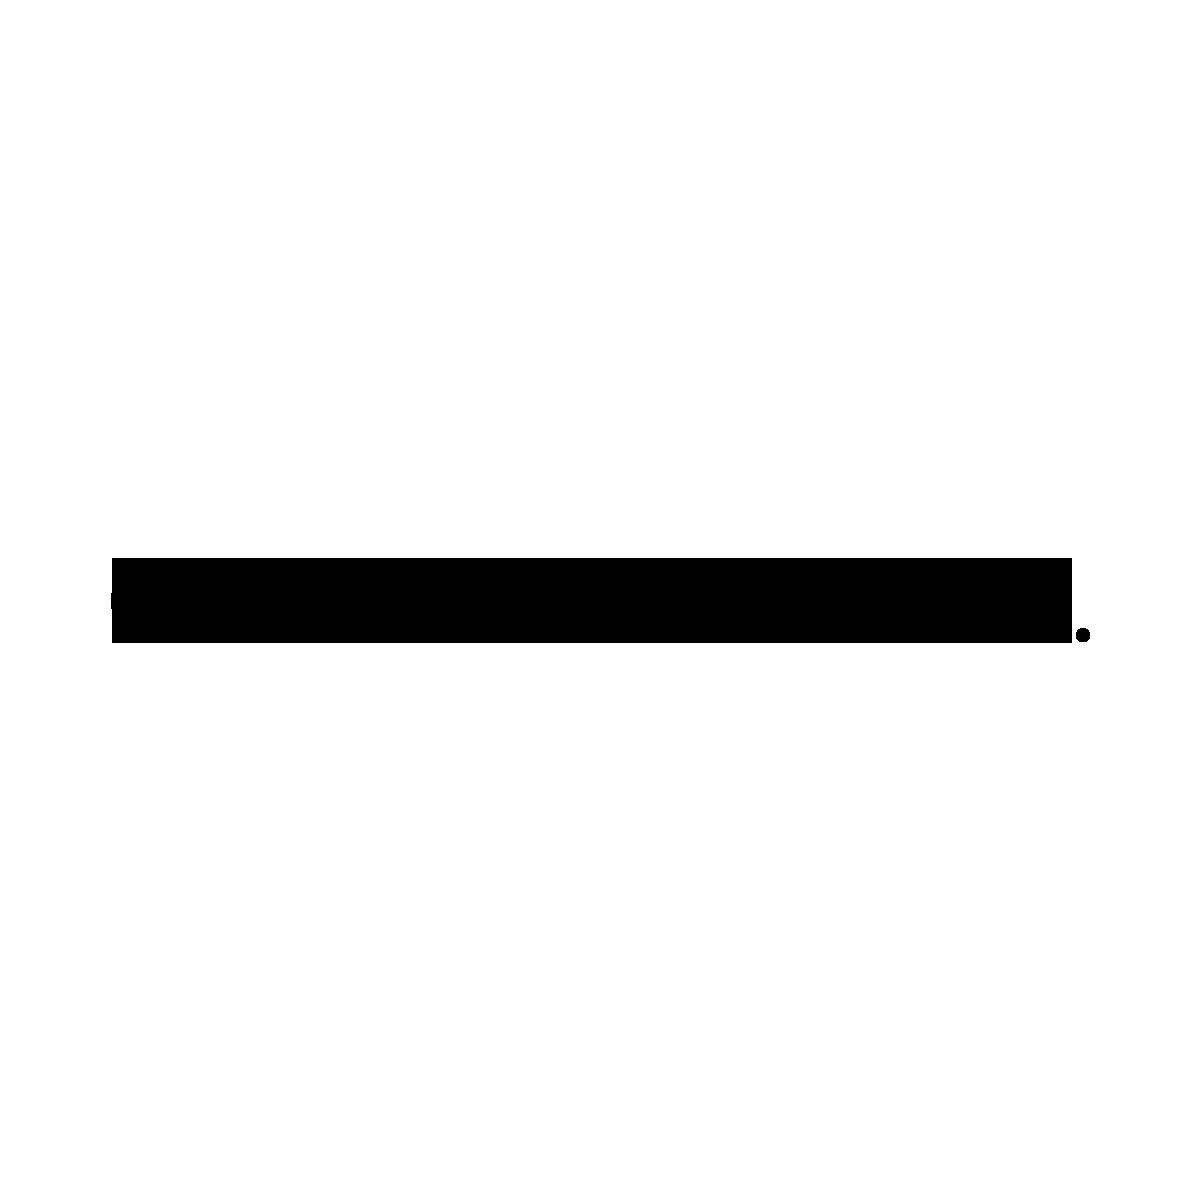 Business-bag-hand-buffed-leather-Cognac